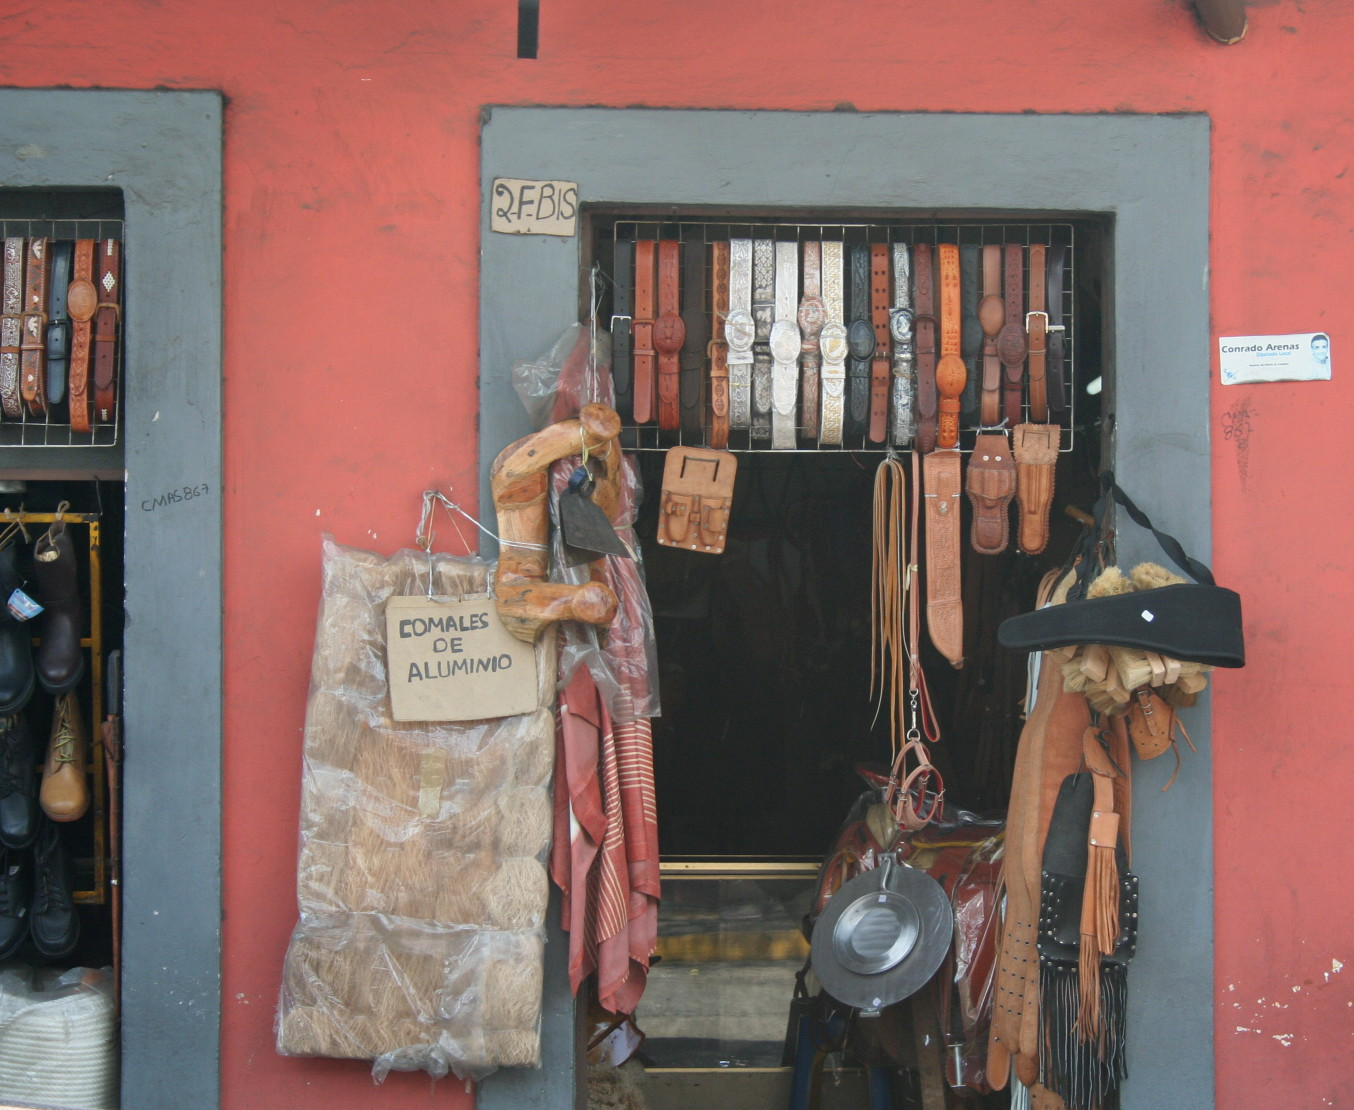 Leather goods   © Felicity Rainnie/Flickr